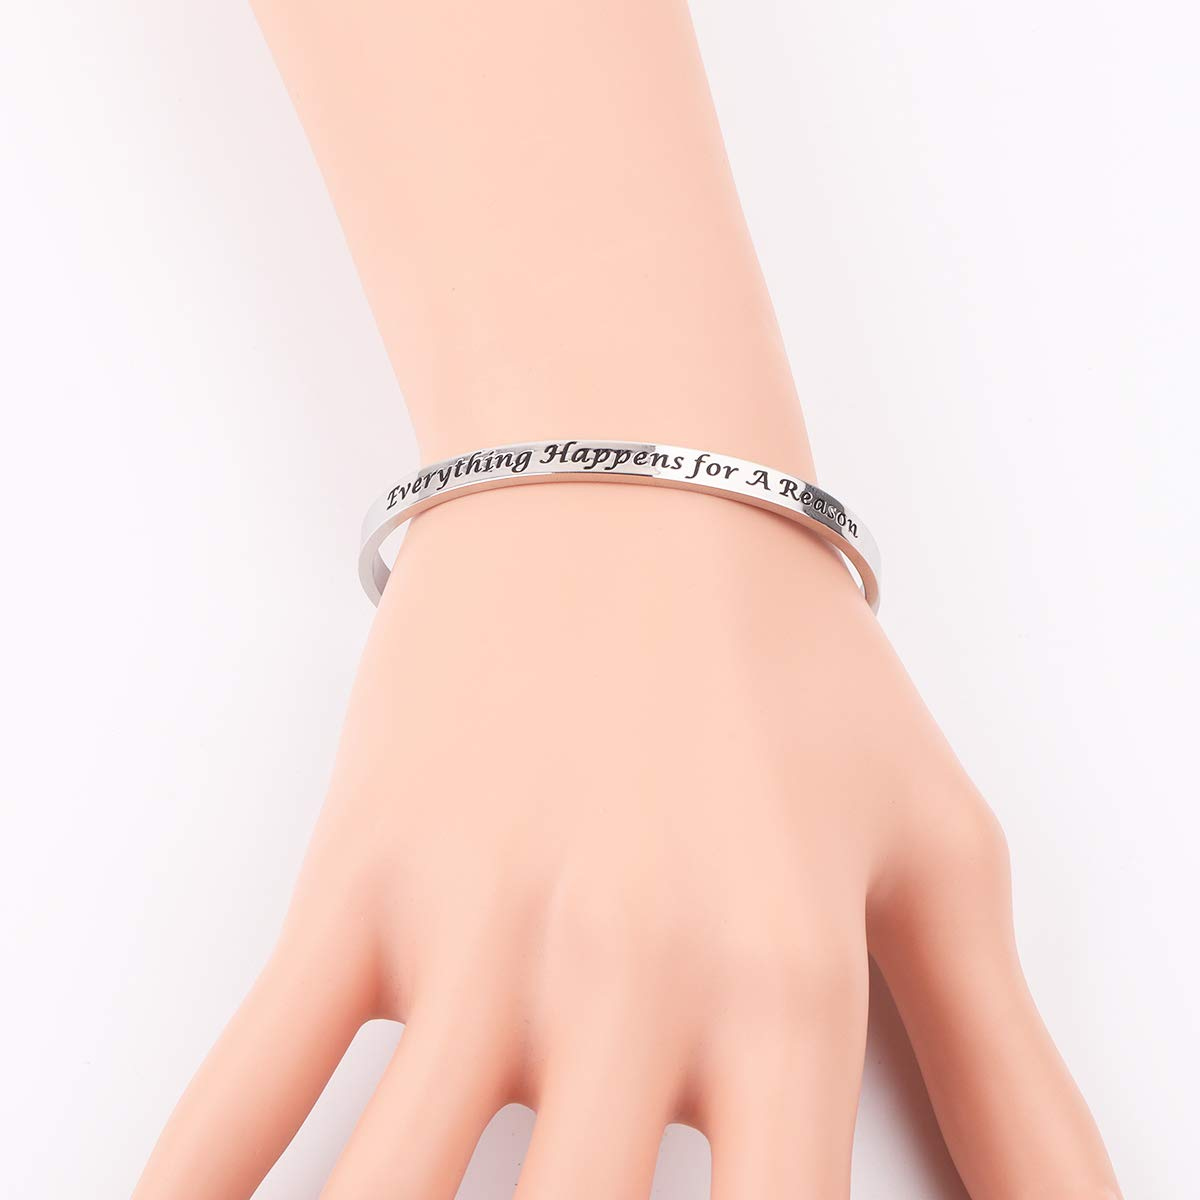 AZFEIYA Inspirational Bracelet Confidence Jewelry Motivational Cuff Bracelet Everything Happens for a Reason Encouragement Bracelet Personalized Birthday Gift (Silver Bracelet) by AZFEIYA (Image #6)